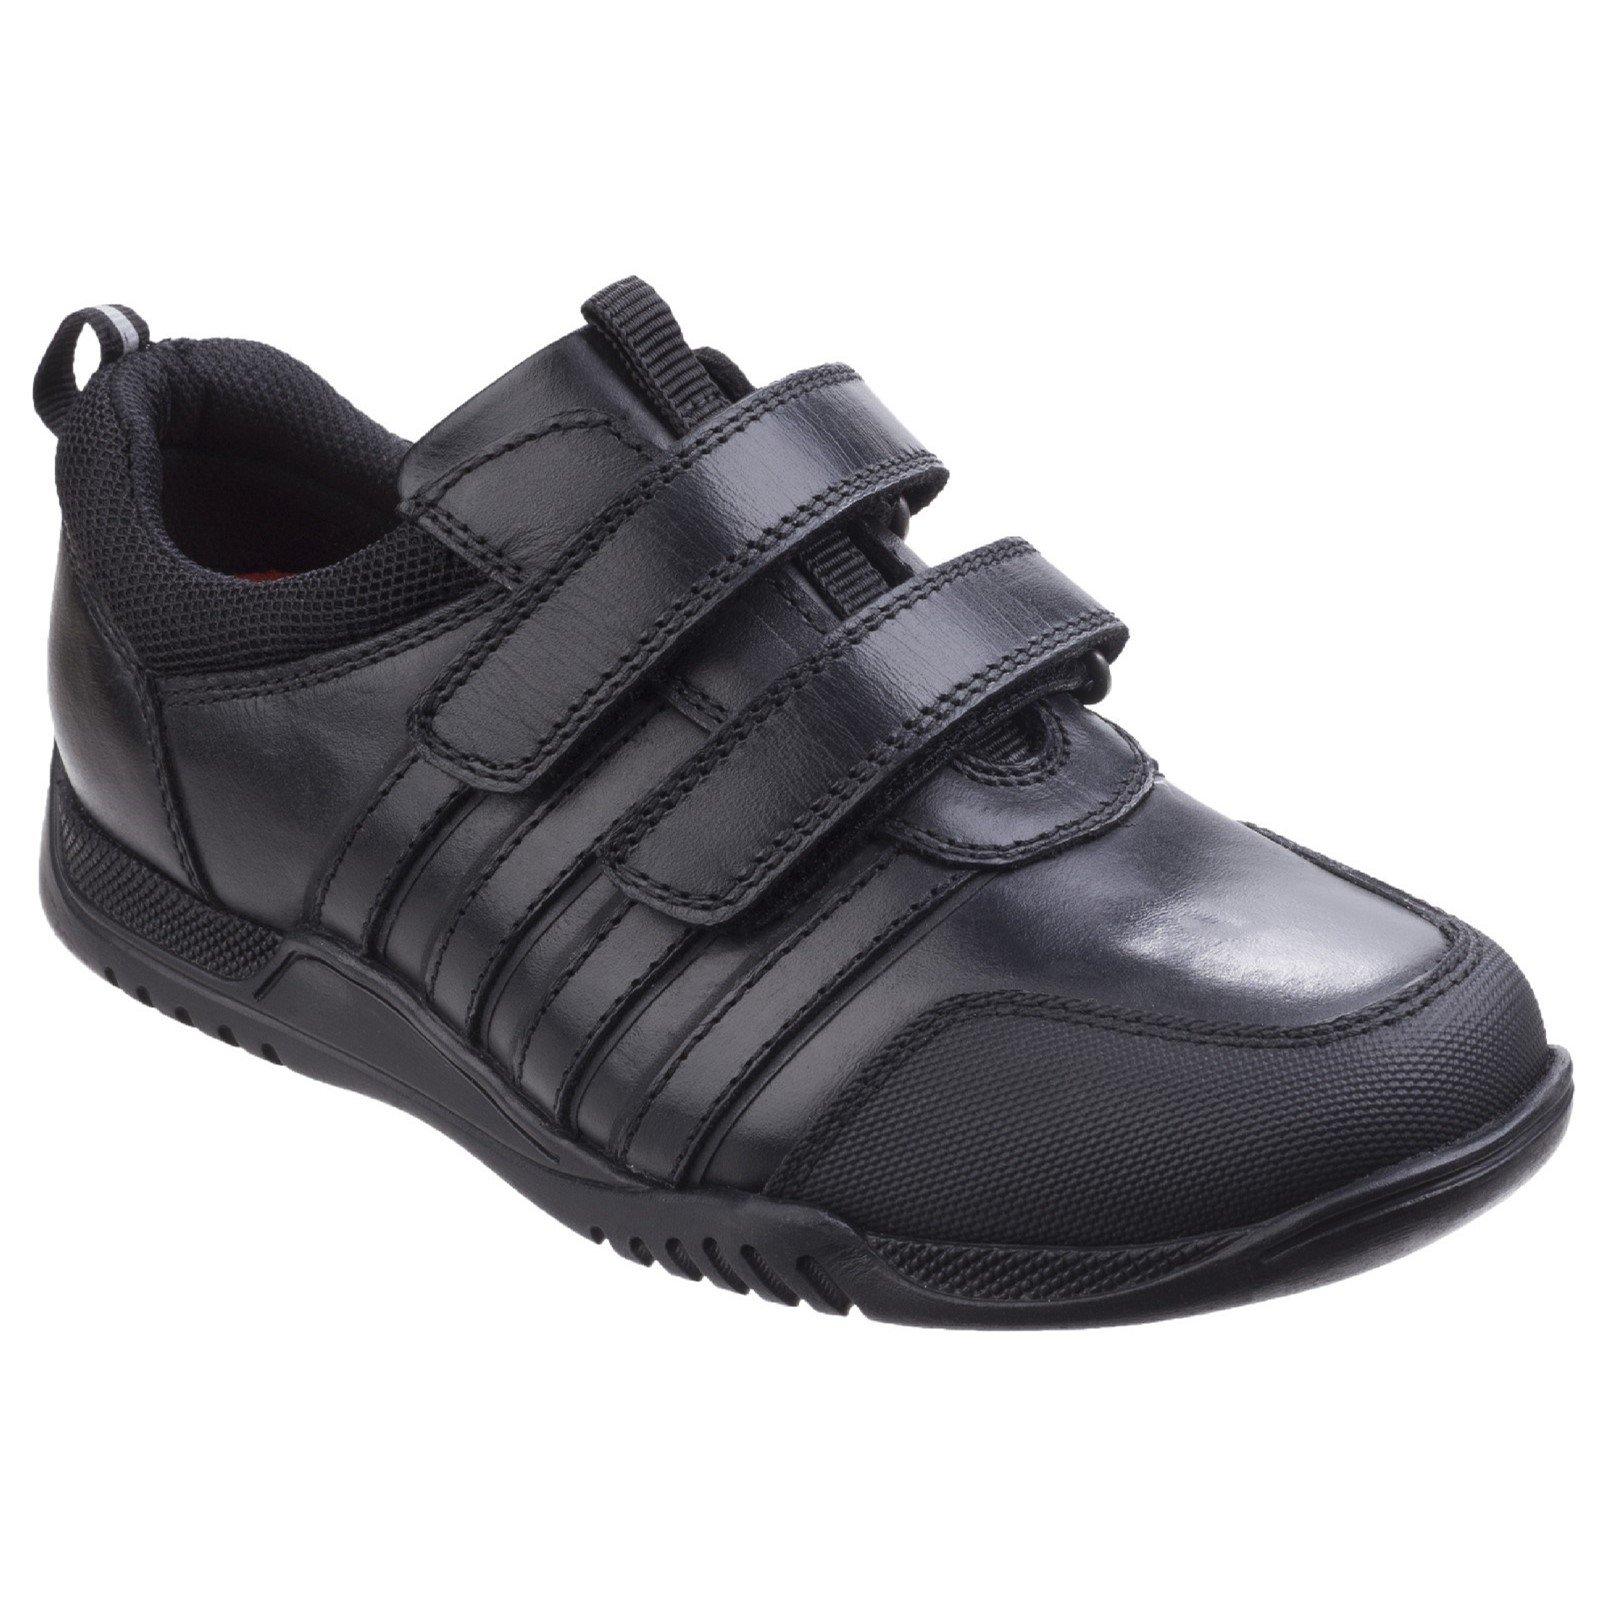 Hush Puppies Kid's Josh Senior School Shoe Black 26396 - Black 3